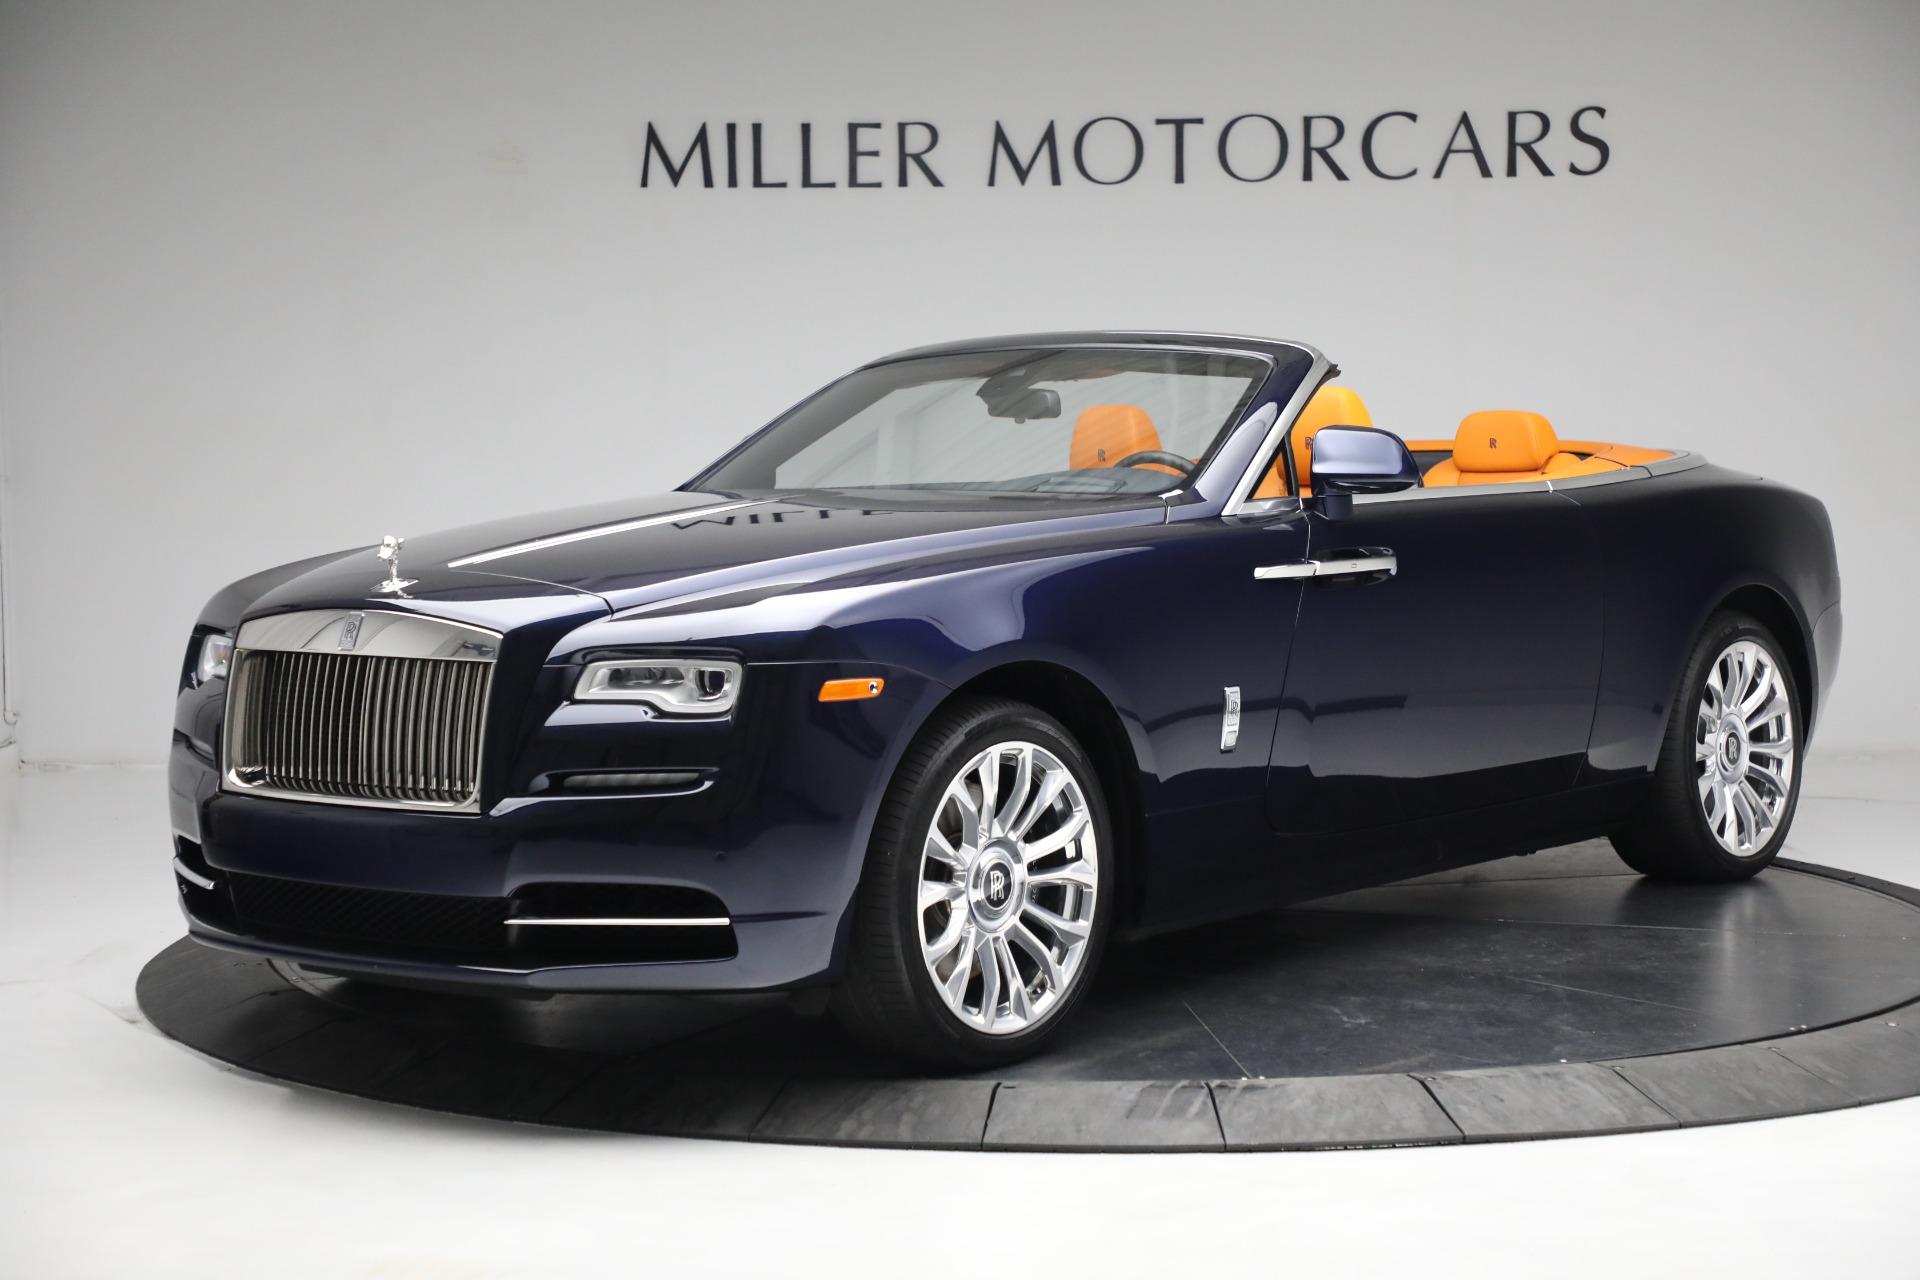 New 2020 Rolls-Royce Dawn for sale Sold at Alfa Romeo of Westport in Westport CT 06880 1